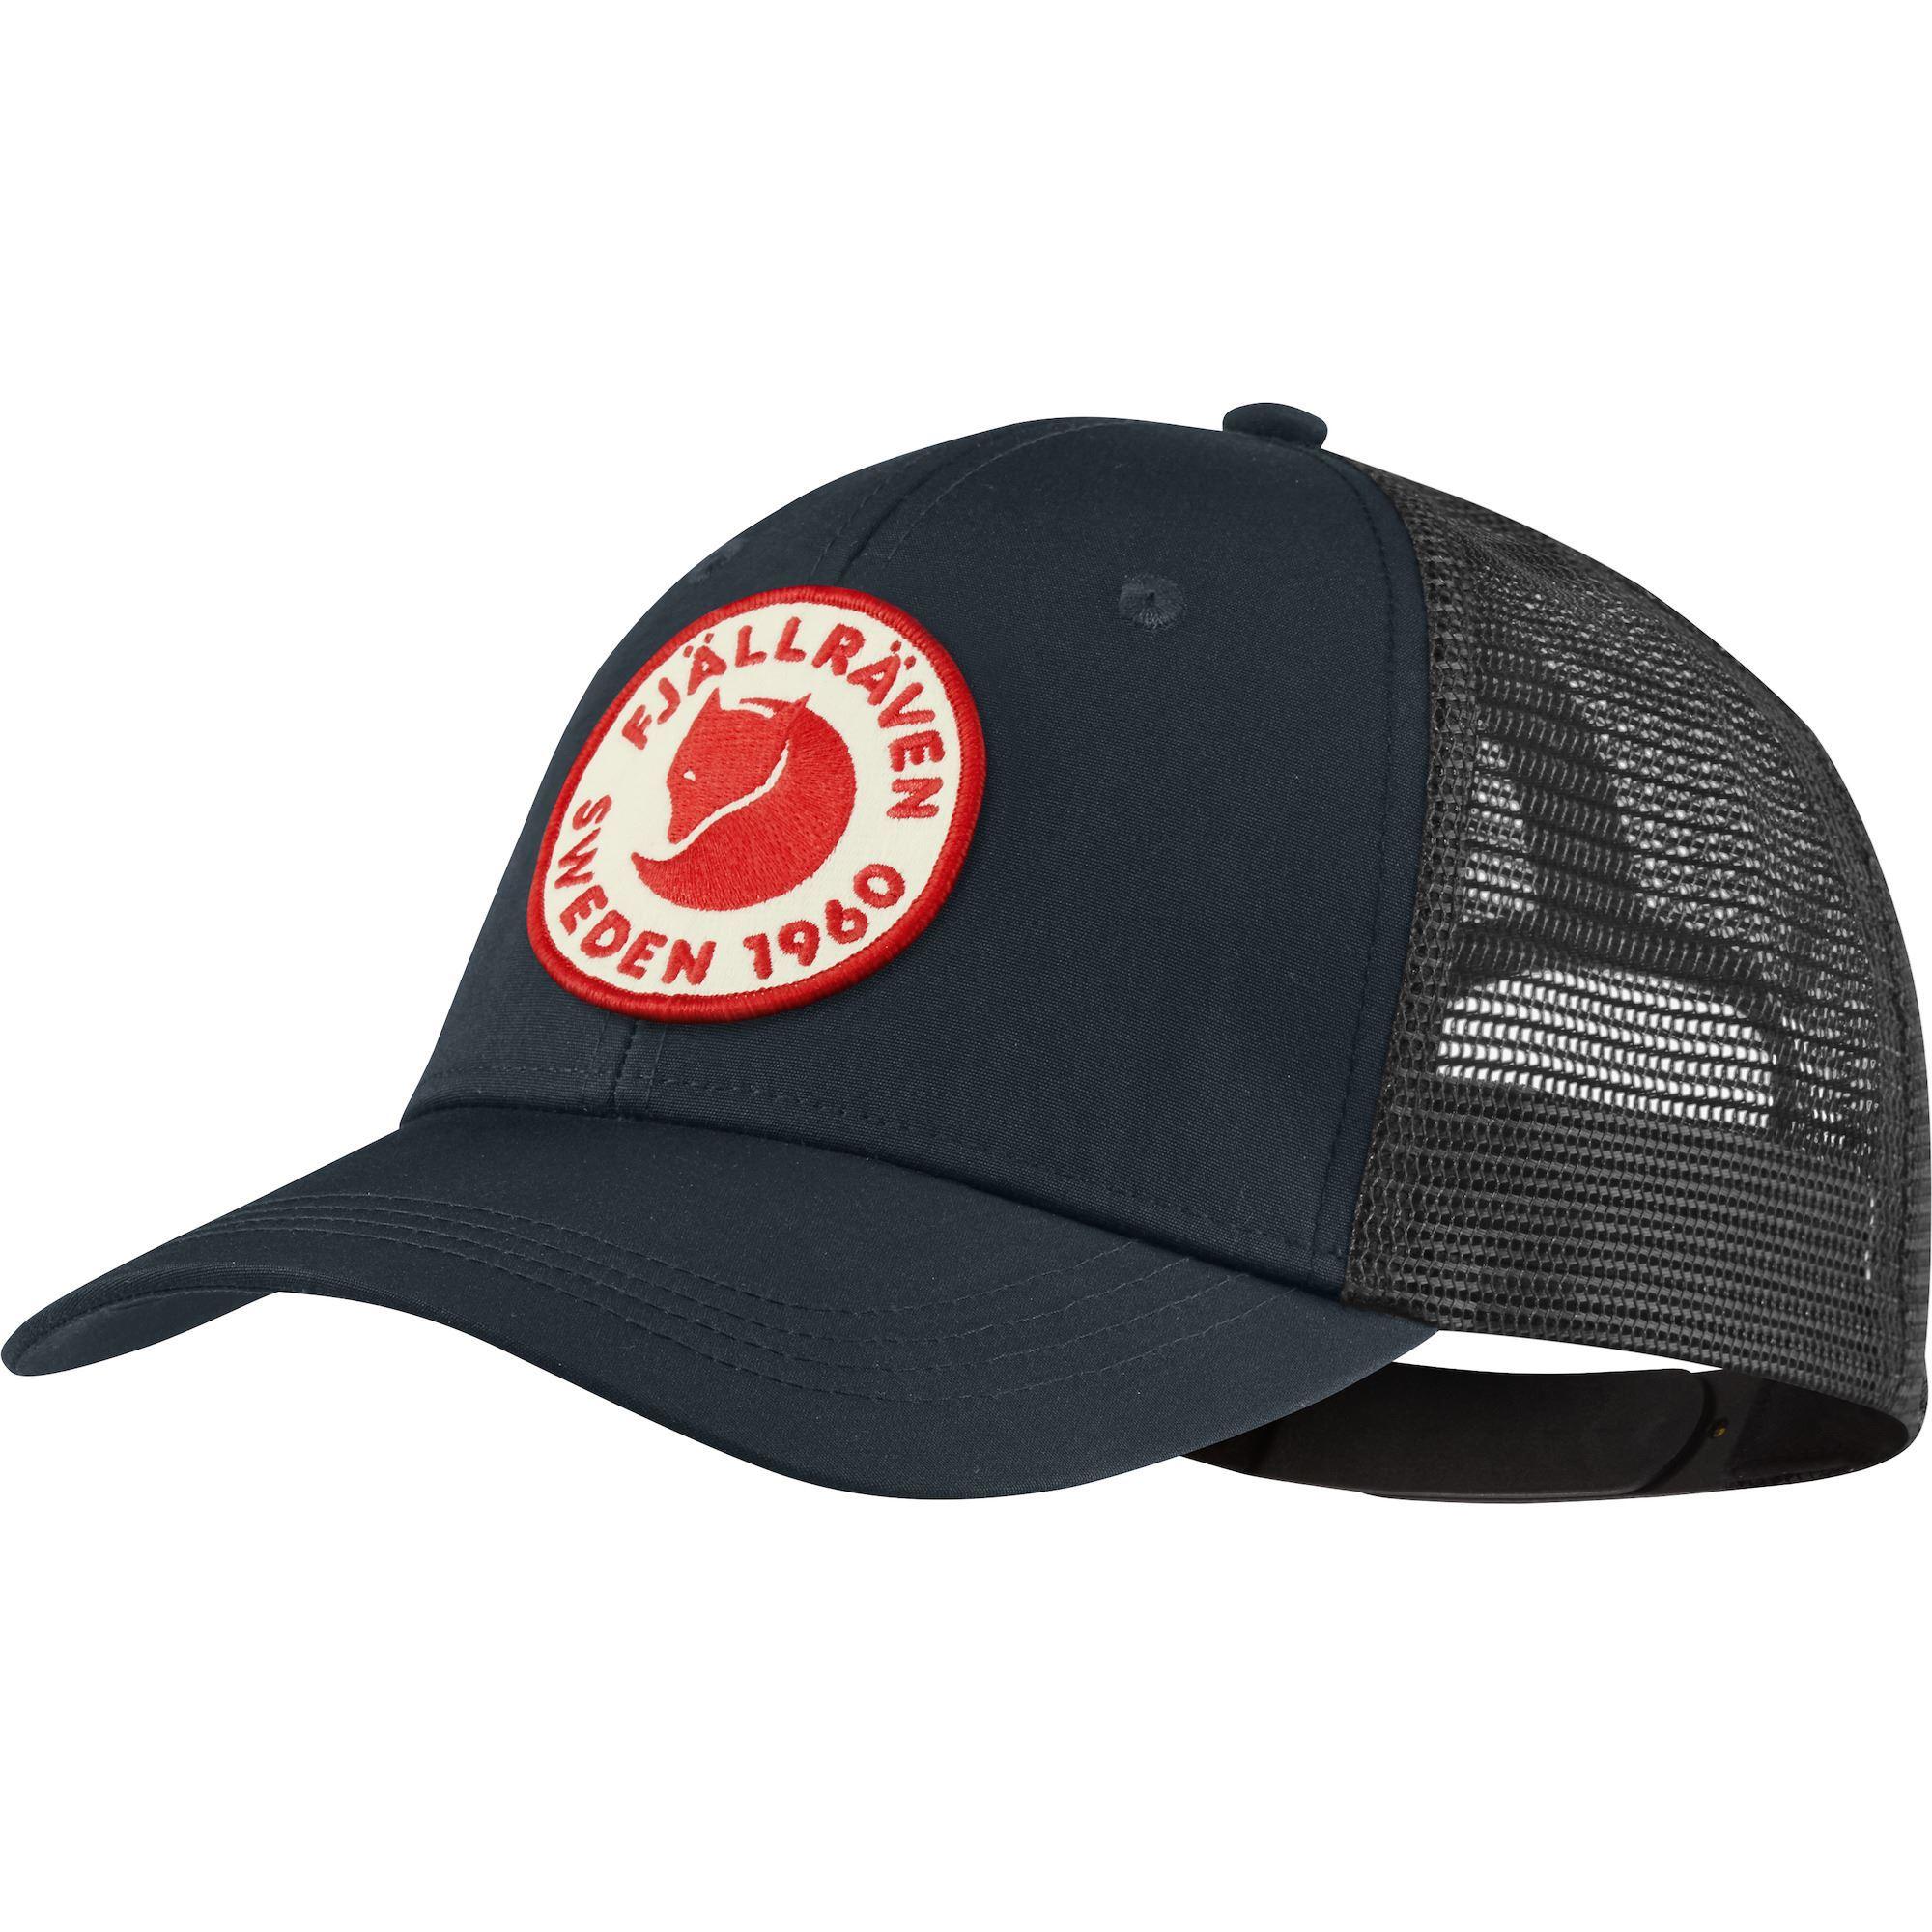 1960 Logo Langtradarkeps Hat - Men's